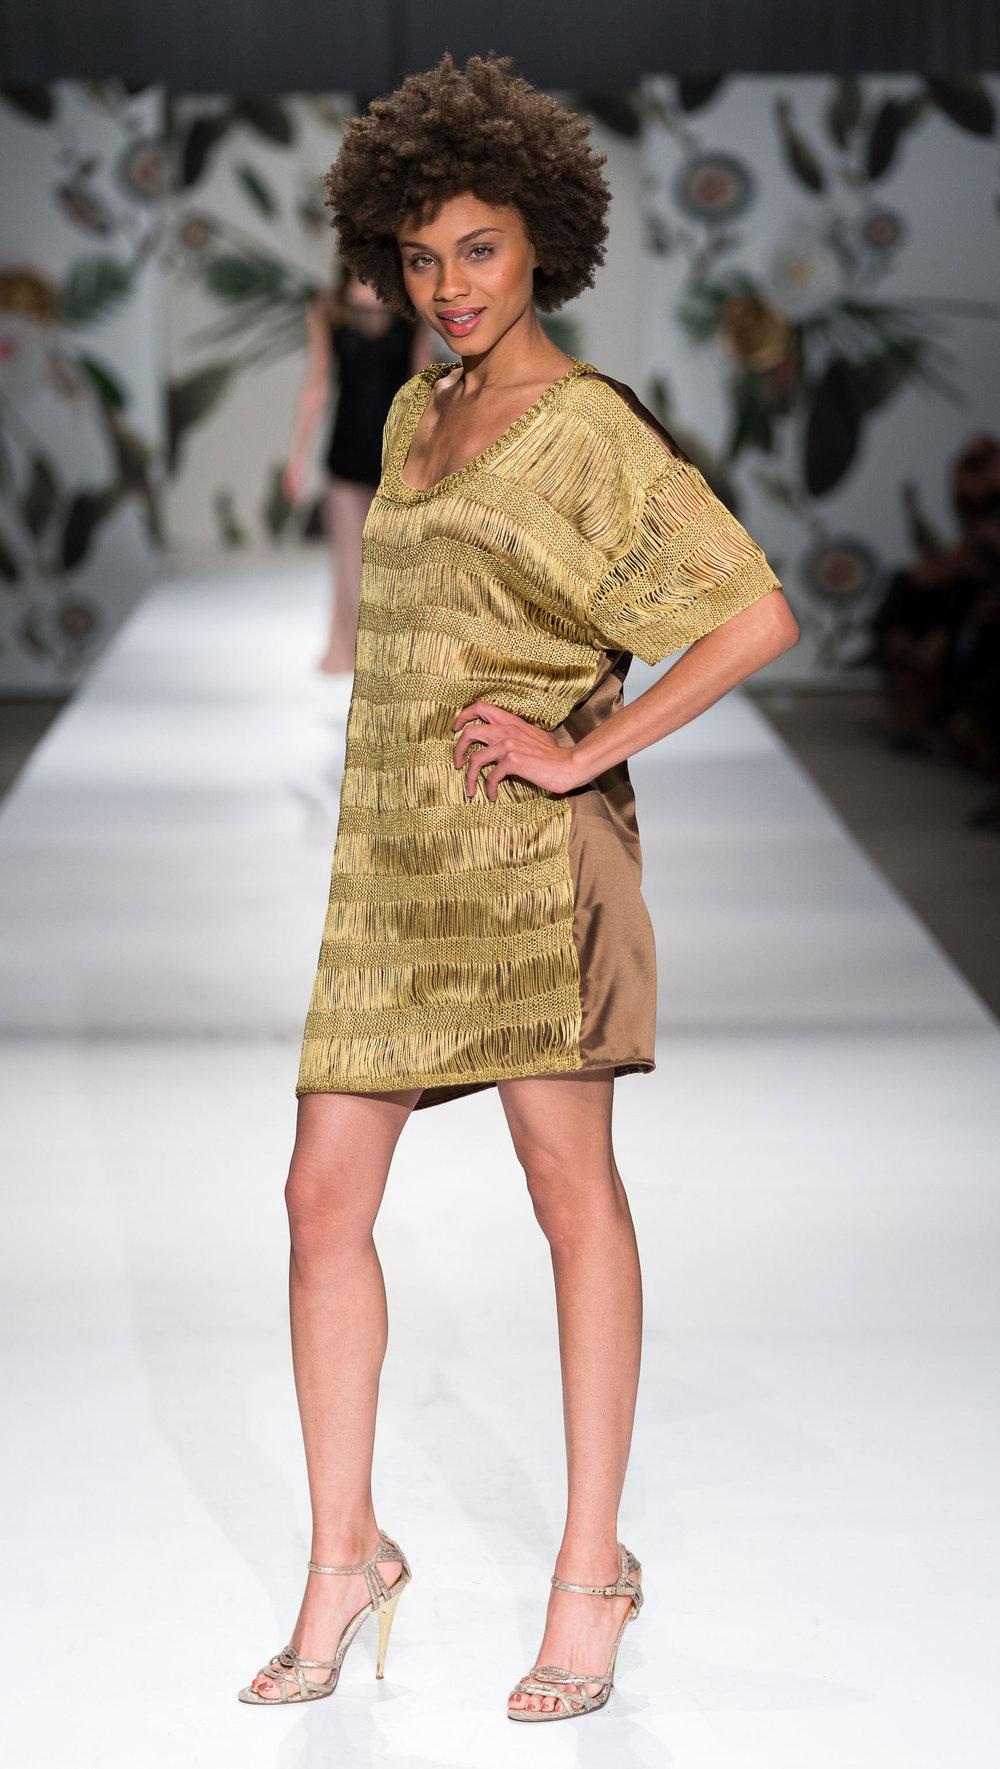 Masha-Osoianu-Design-(4).jpg